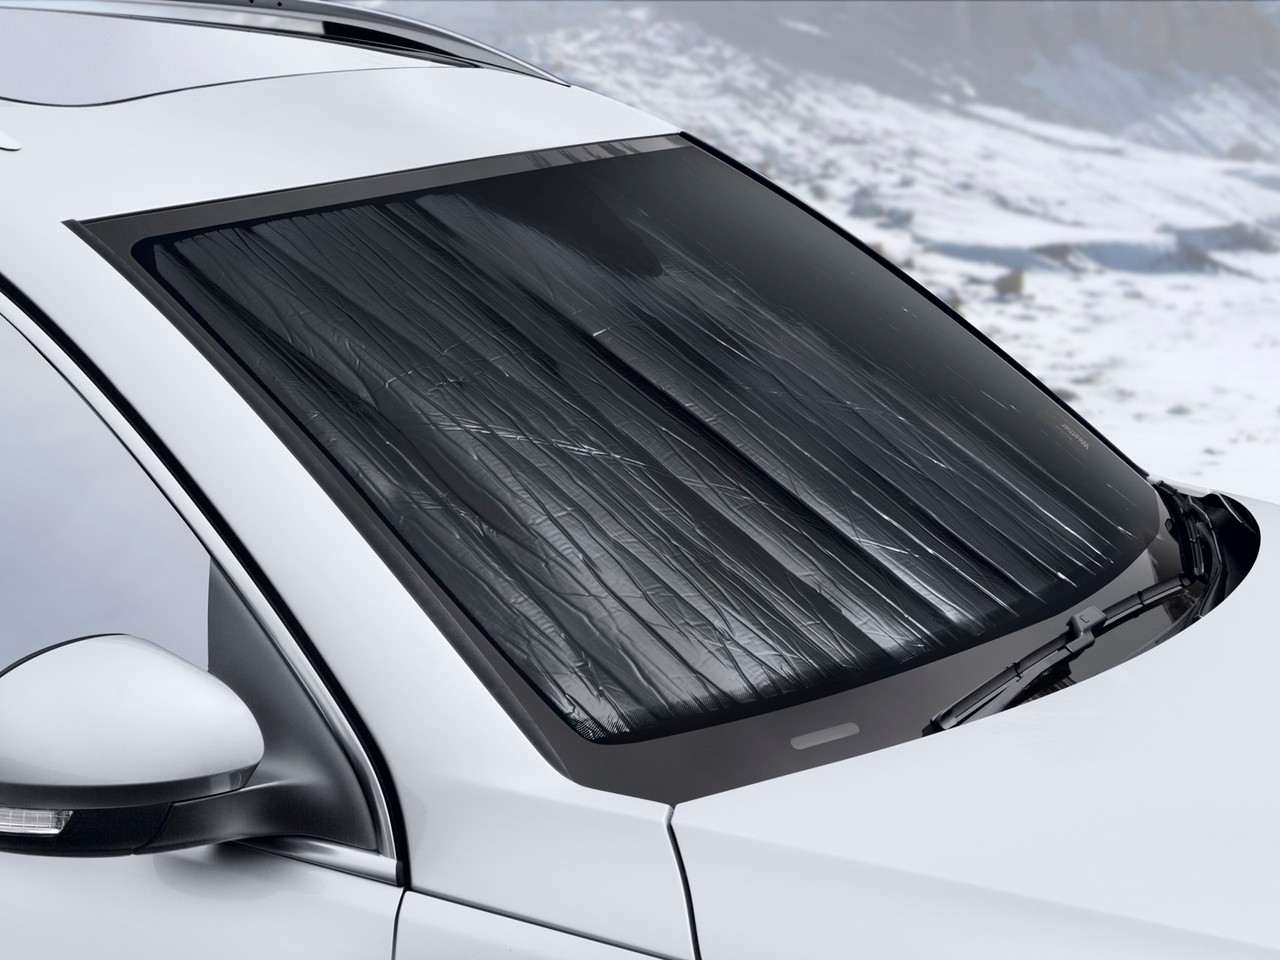 2020-2022 Hyundai Palisade Sun Shade (Representational Image)